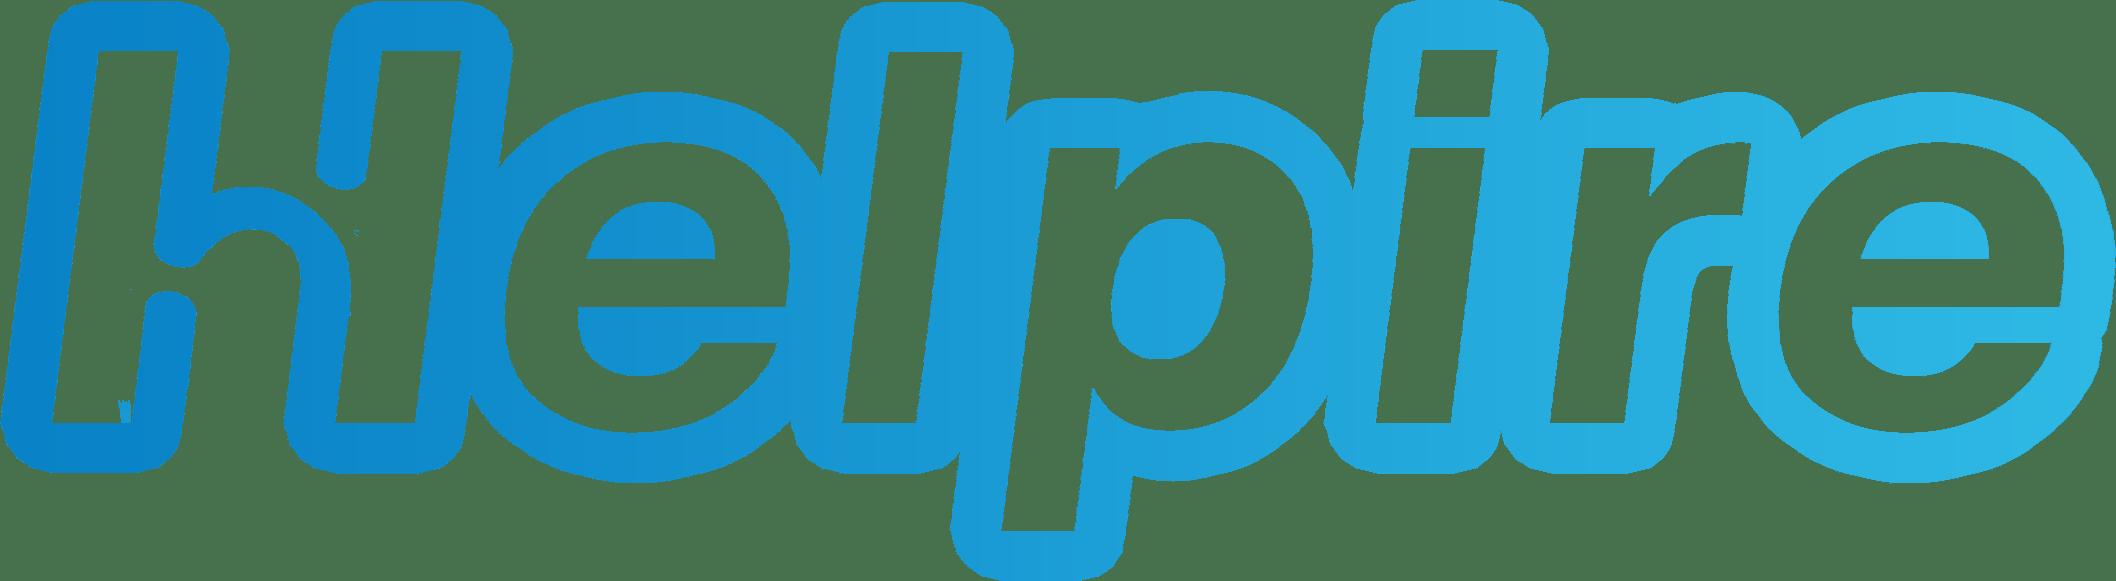 Helpire logo